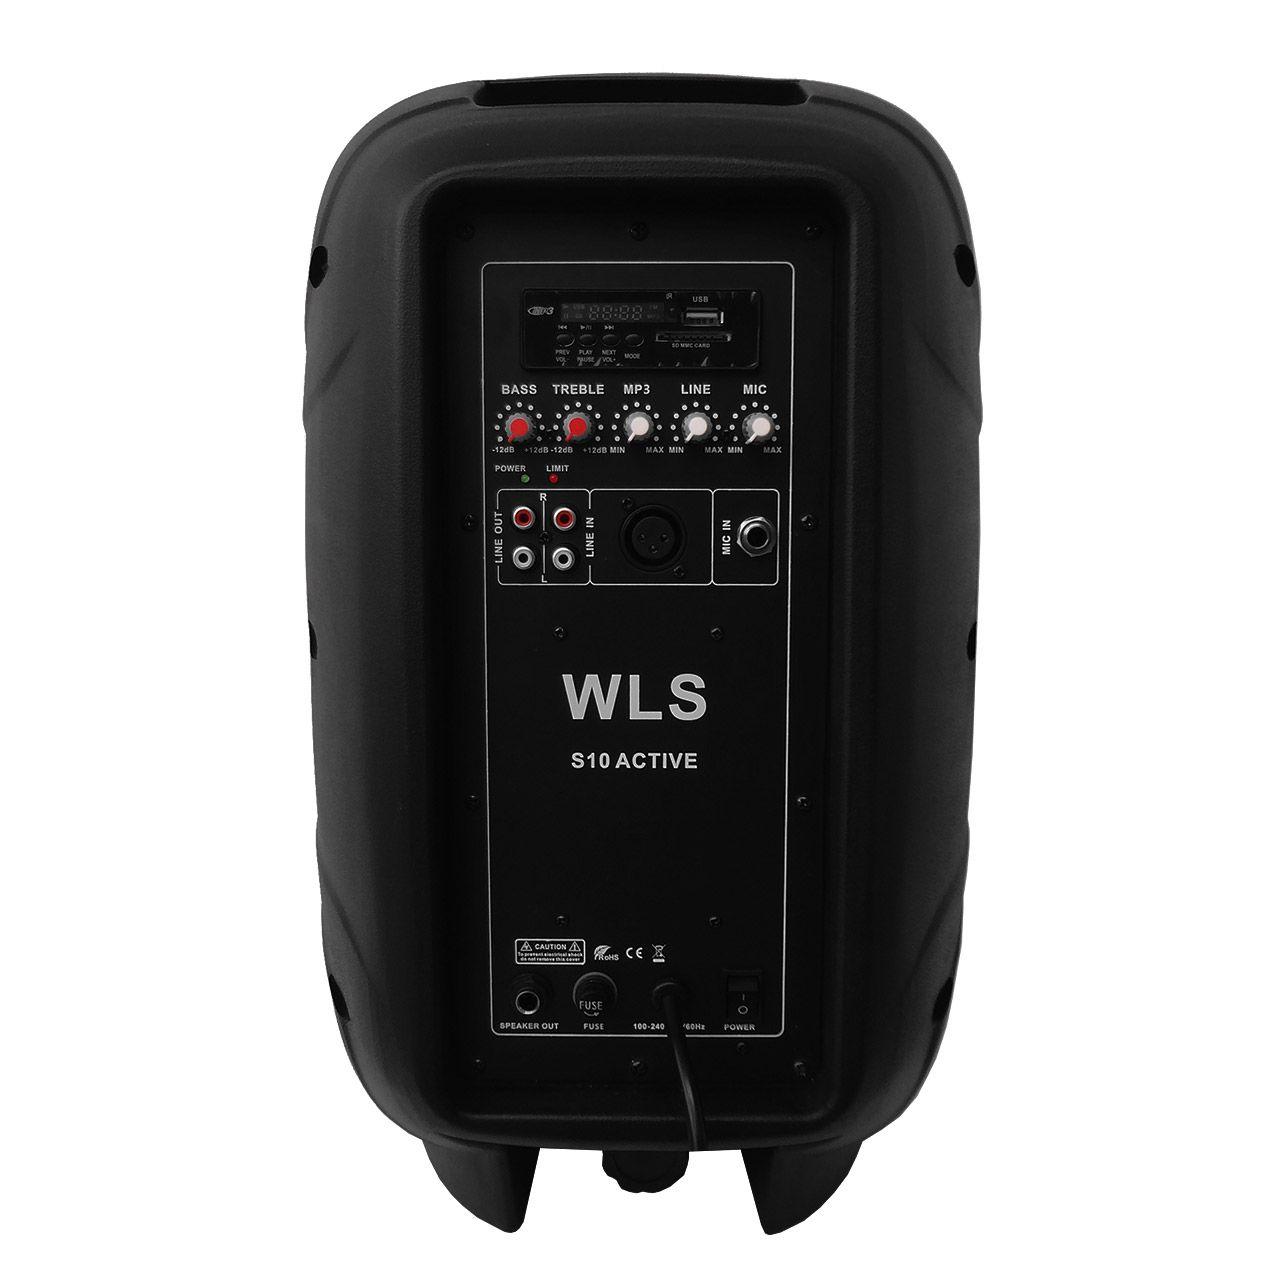 Kit Caixa de Som Ativa Passiva Wls S10 Bluetooth 250w + Cabo